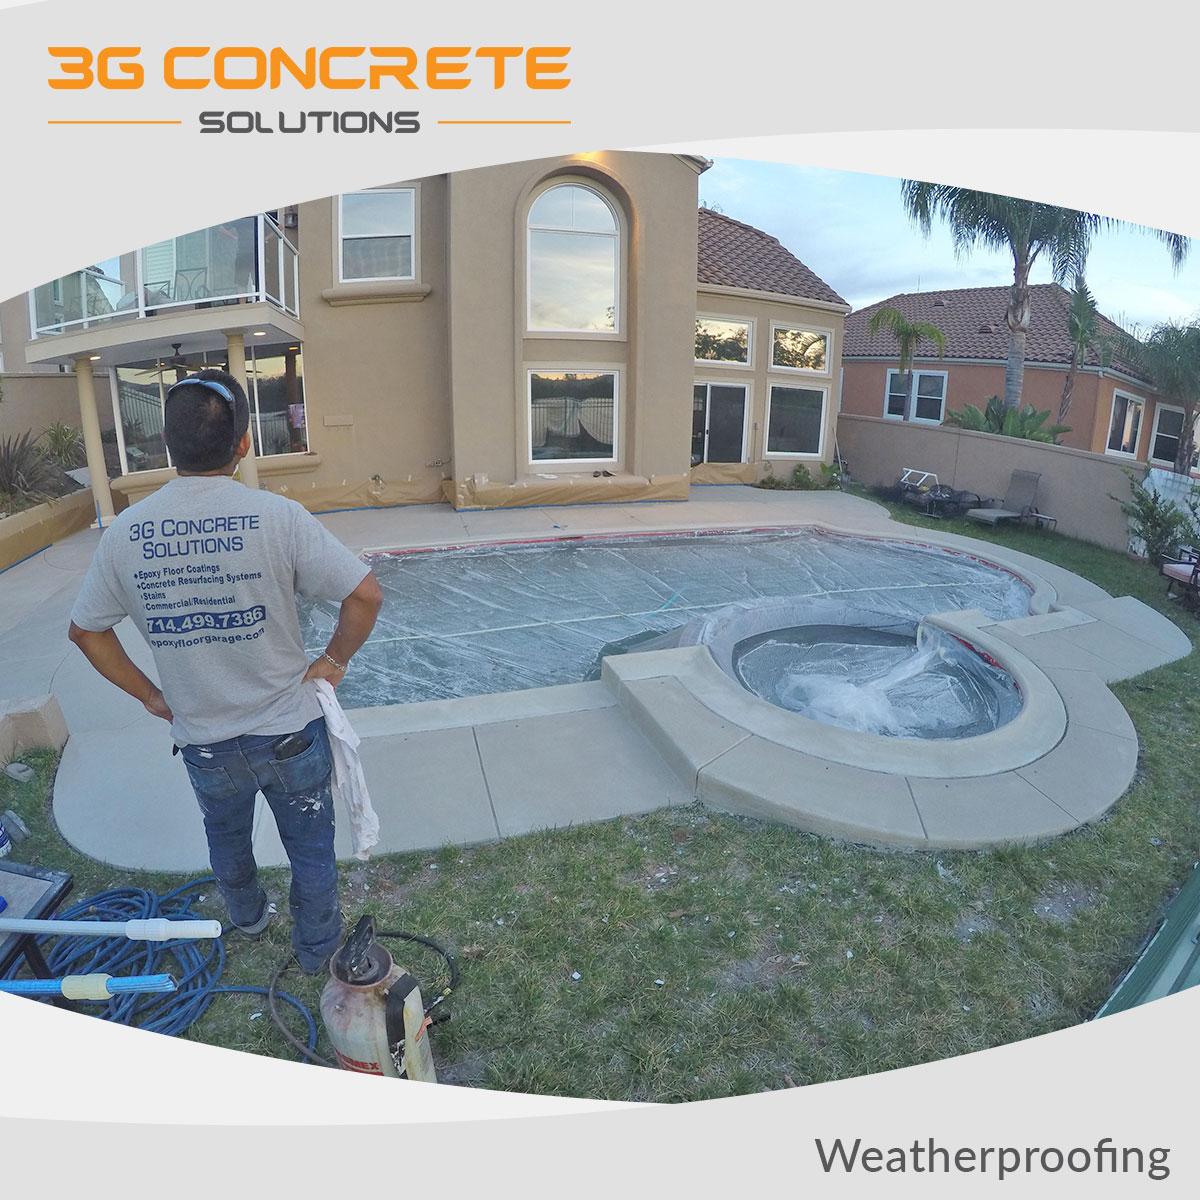 FB- Concrete Weatherproofing in Orange County